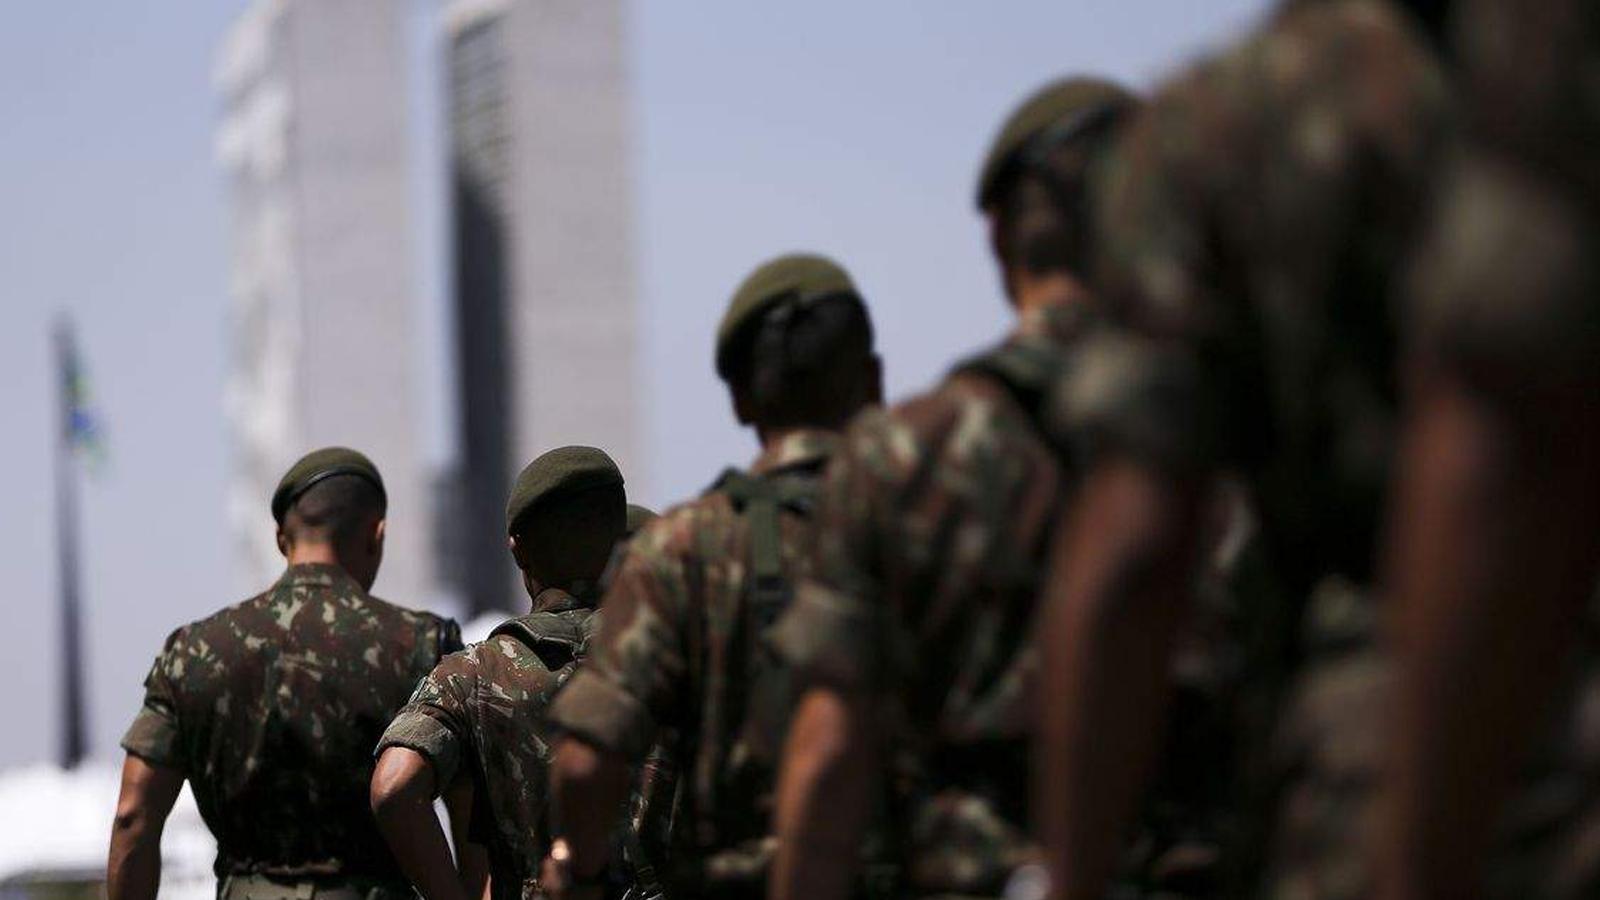 Alistamento militar entra na última semana